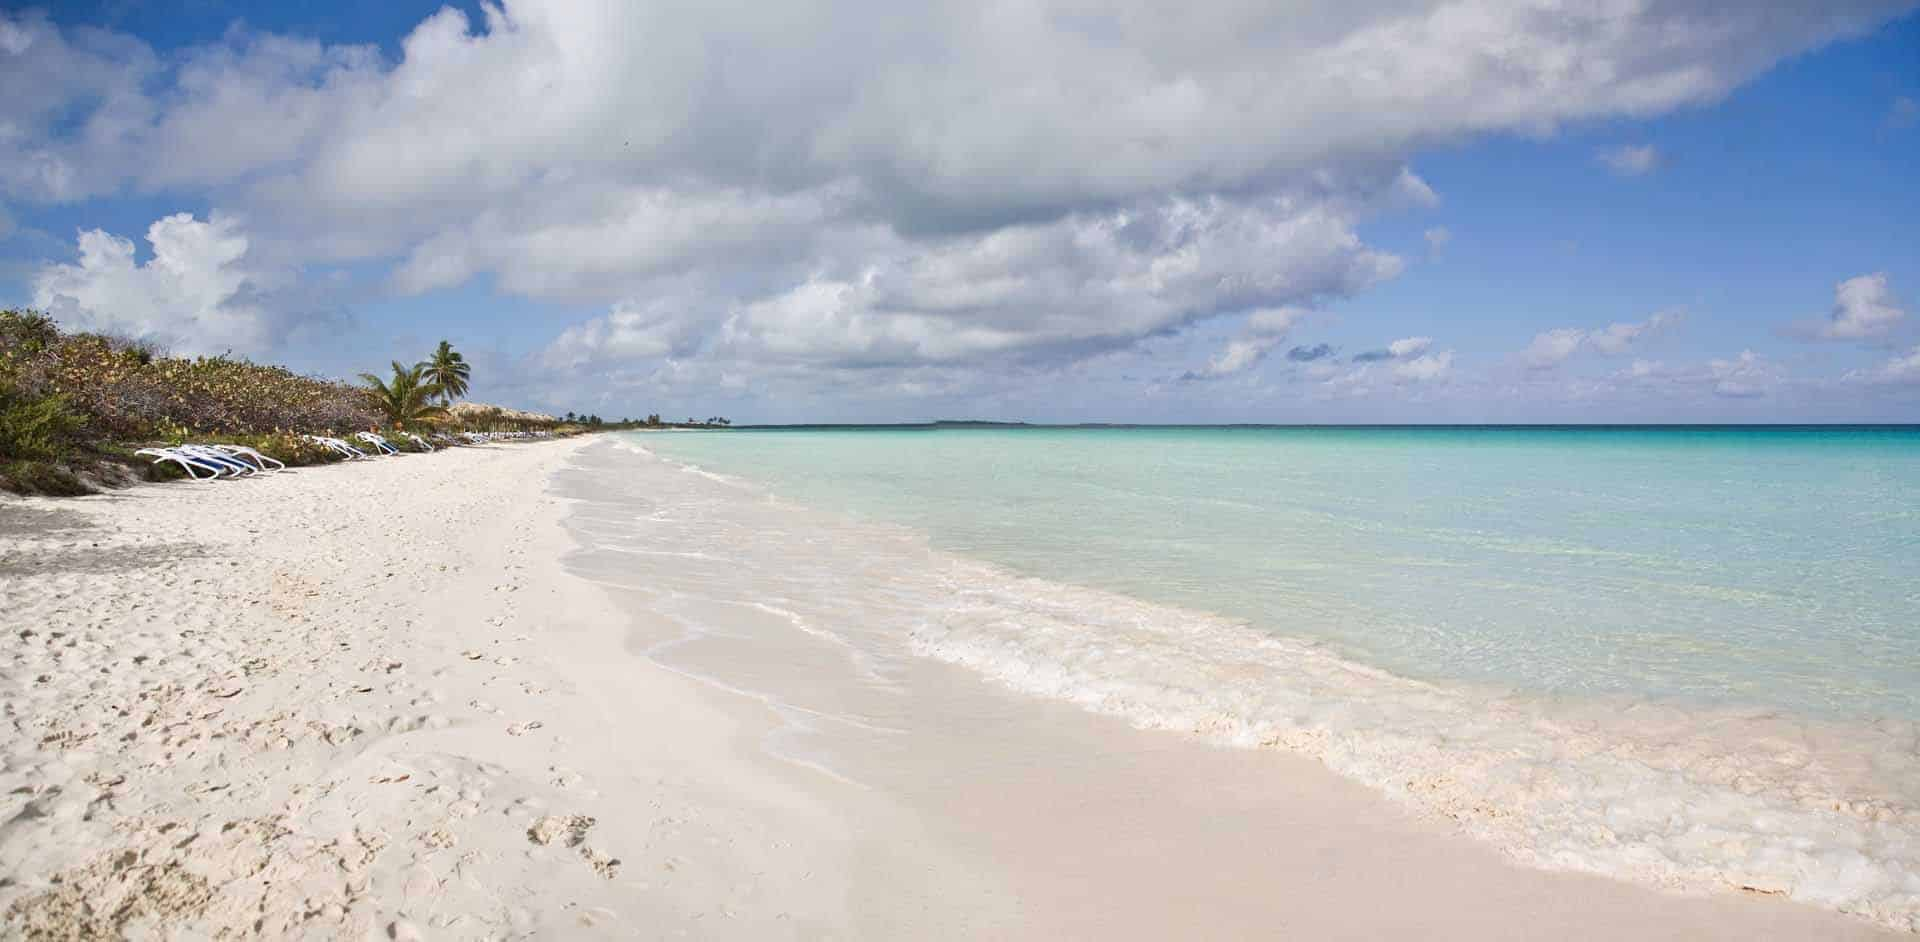 A0211 journee plage cayo santa maria 02 cuba autrement